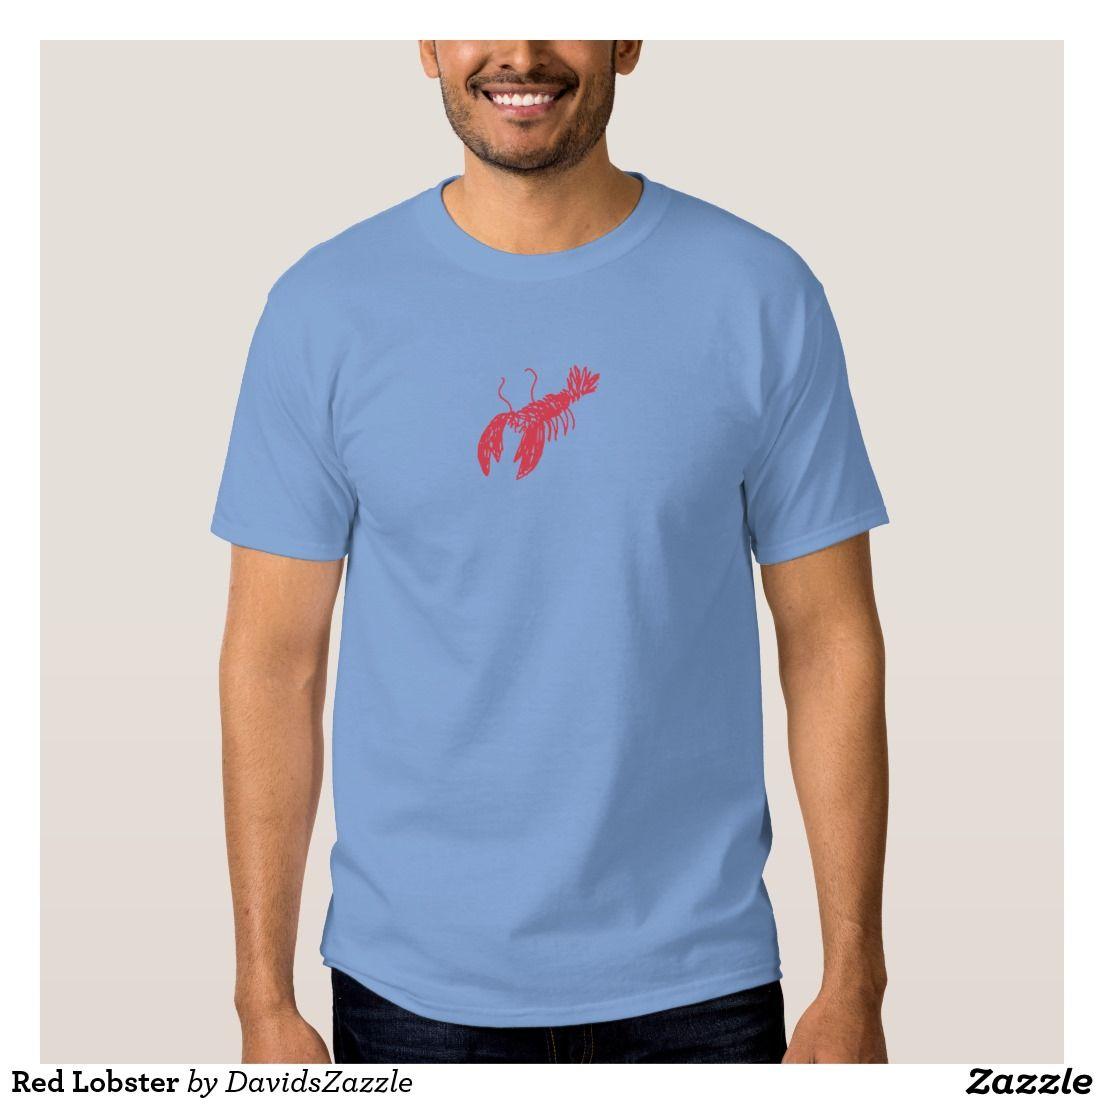 Red Lobster TShirt T shirt, Shirts, Tee shirts